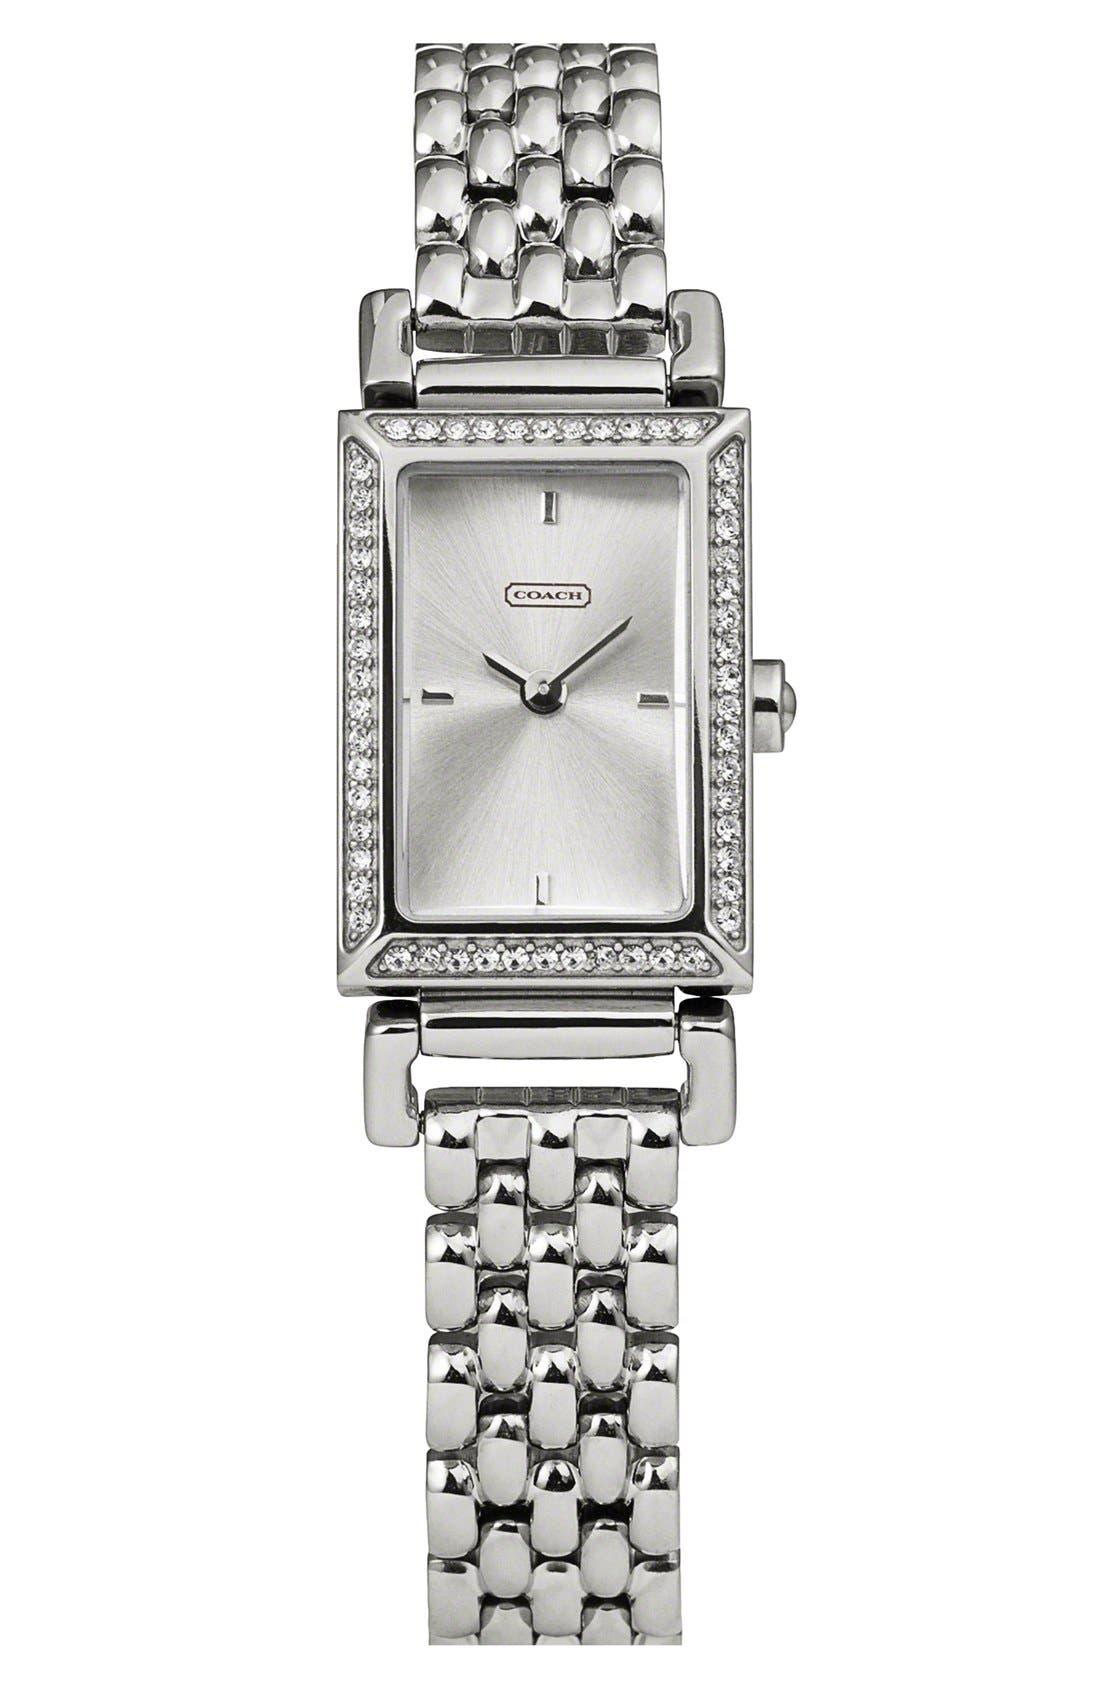 Main Image - COACH 'Madison' Crystal Bezel Bracelet Watch, 17mm x 30mm